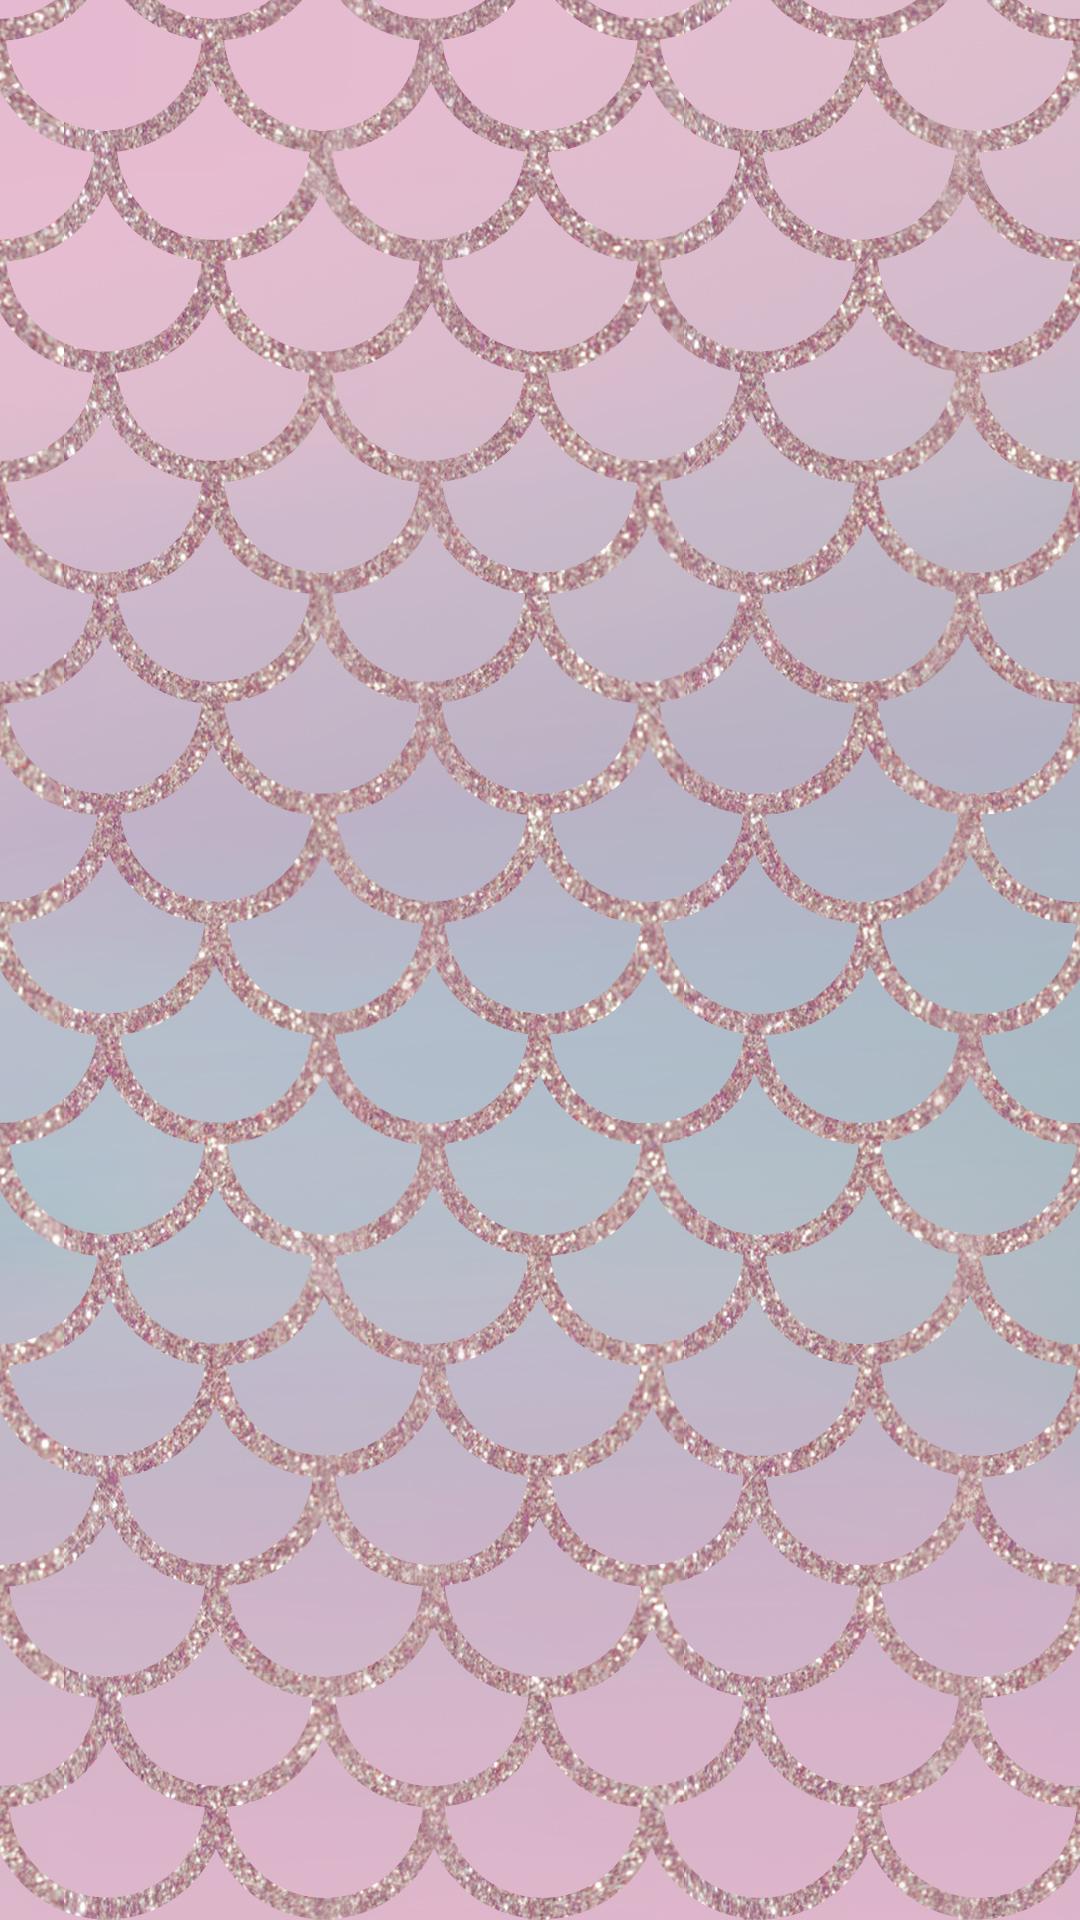 Top Wallpaper Marble Artsy - artsy-iPhone_wallpaper_5  Pic_751023.jpg